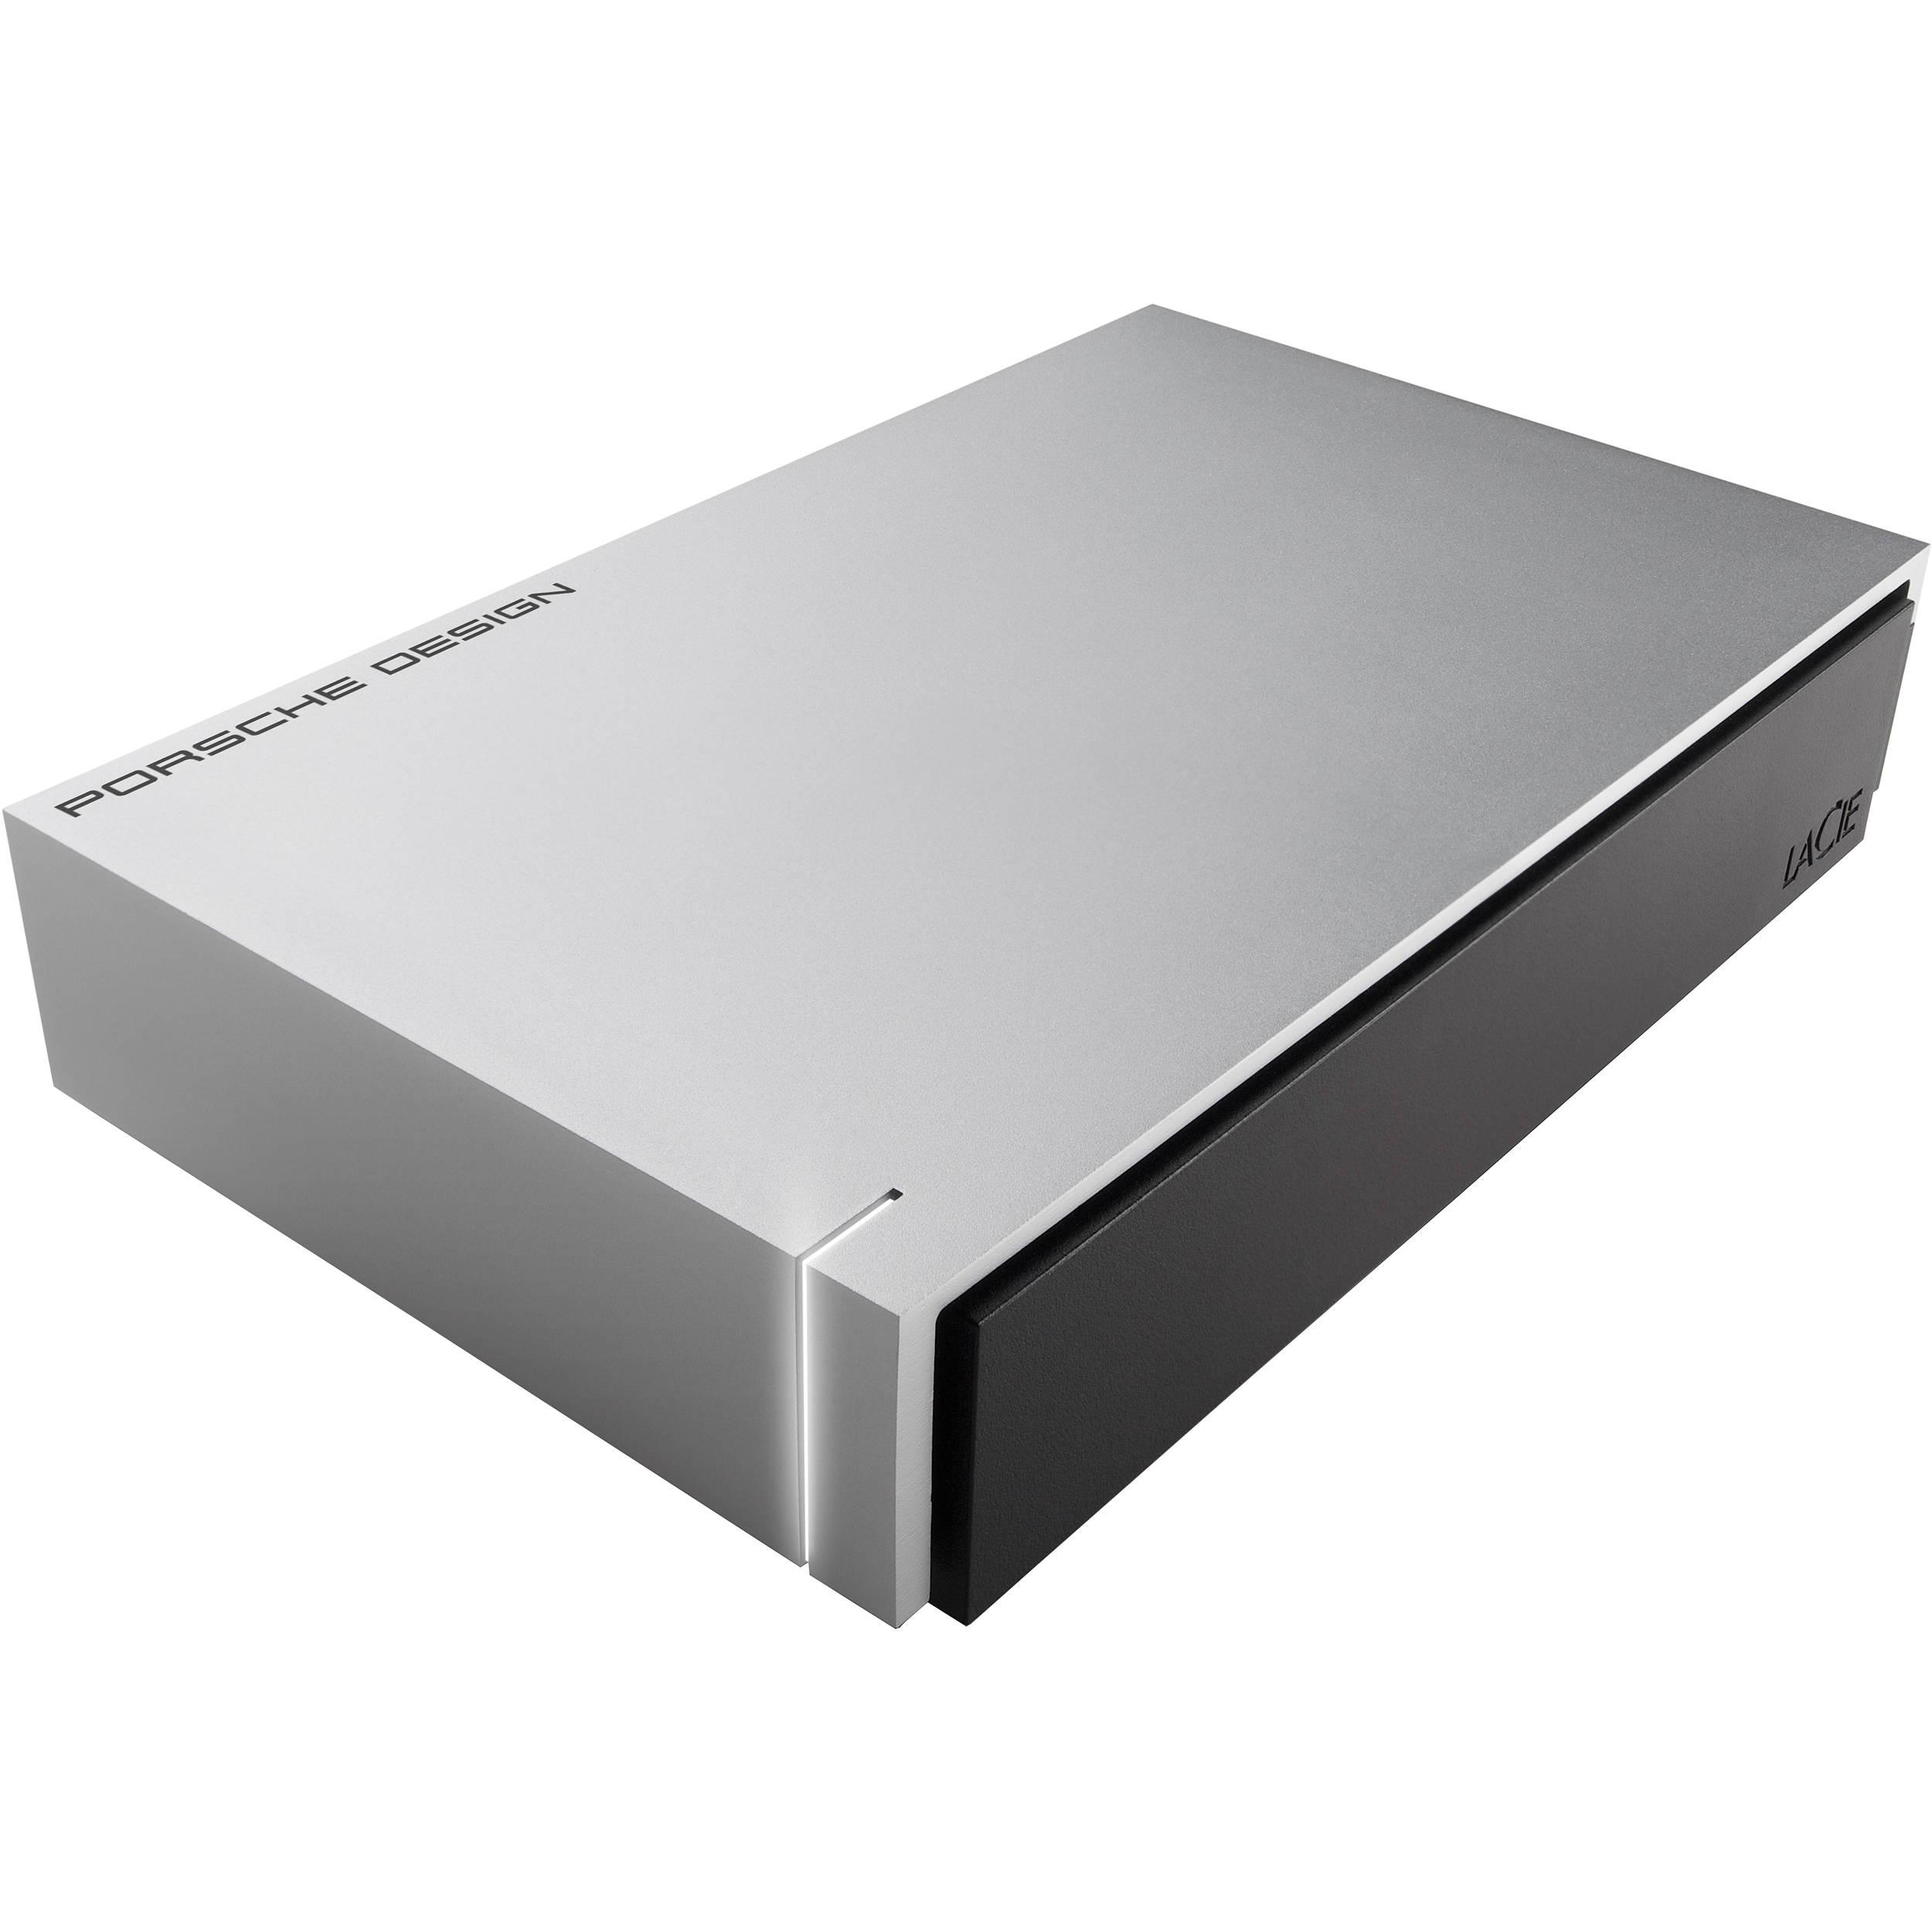 Ext. HDD LaCie Porsche Design Desktop 4TB USB 3.0